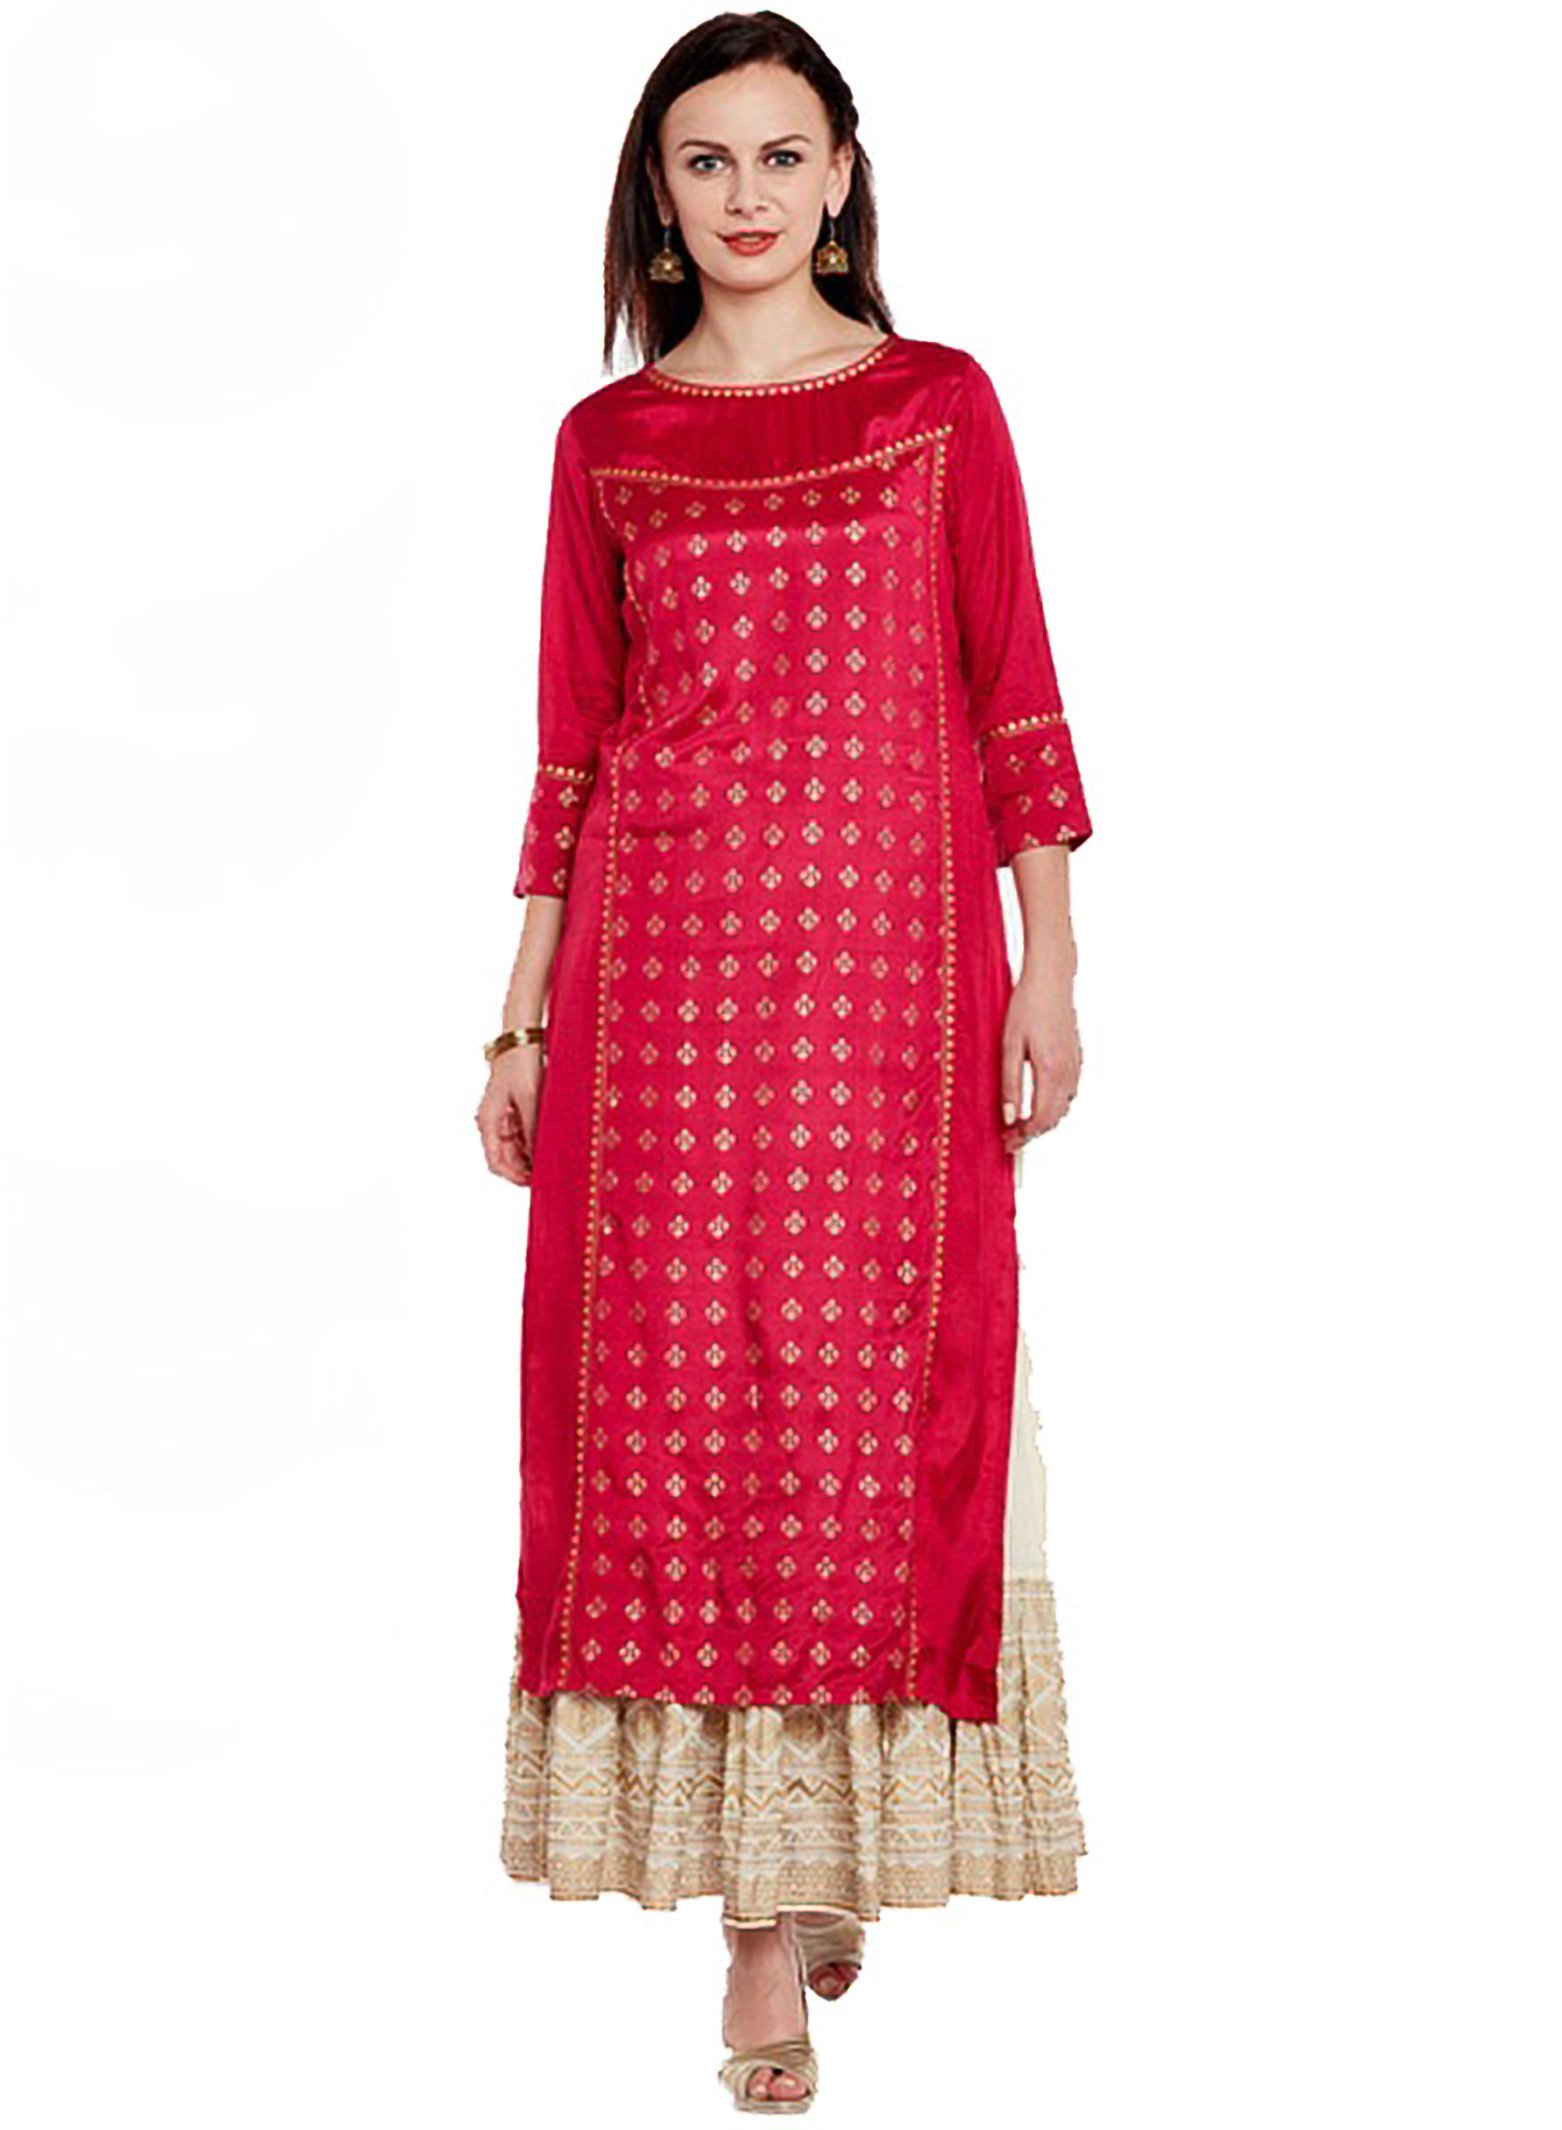 Manas Crafts Indian Women Designer Kurta Kurti Bollywood Tunic Ethnic Pakistani Top Crepe Kurtis Dress Tunics Cotton Tops Blouse Style Long Silk